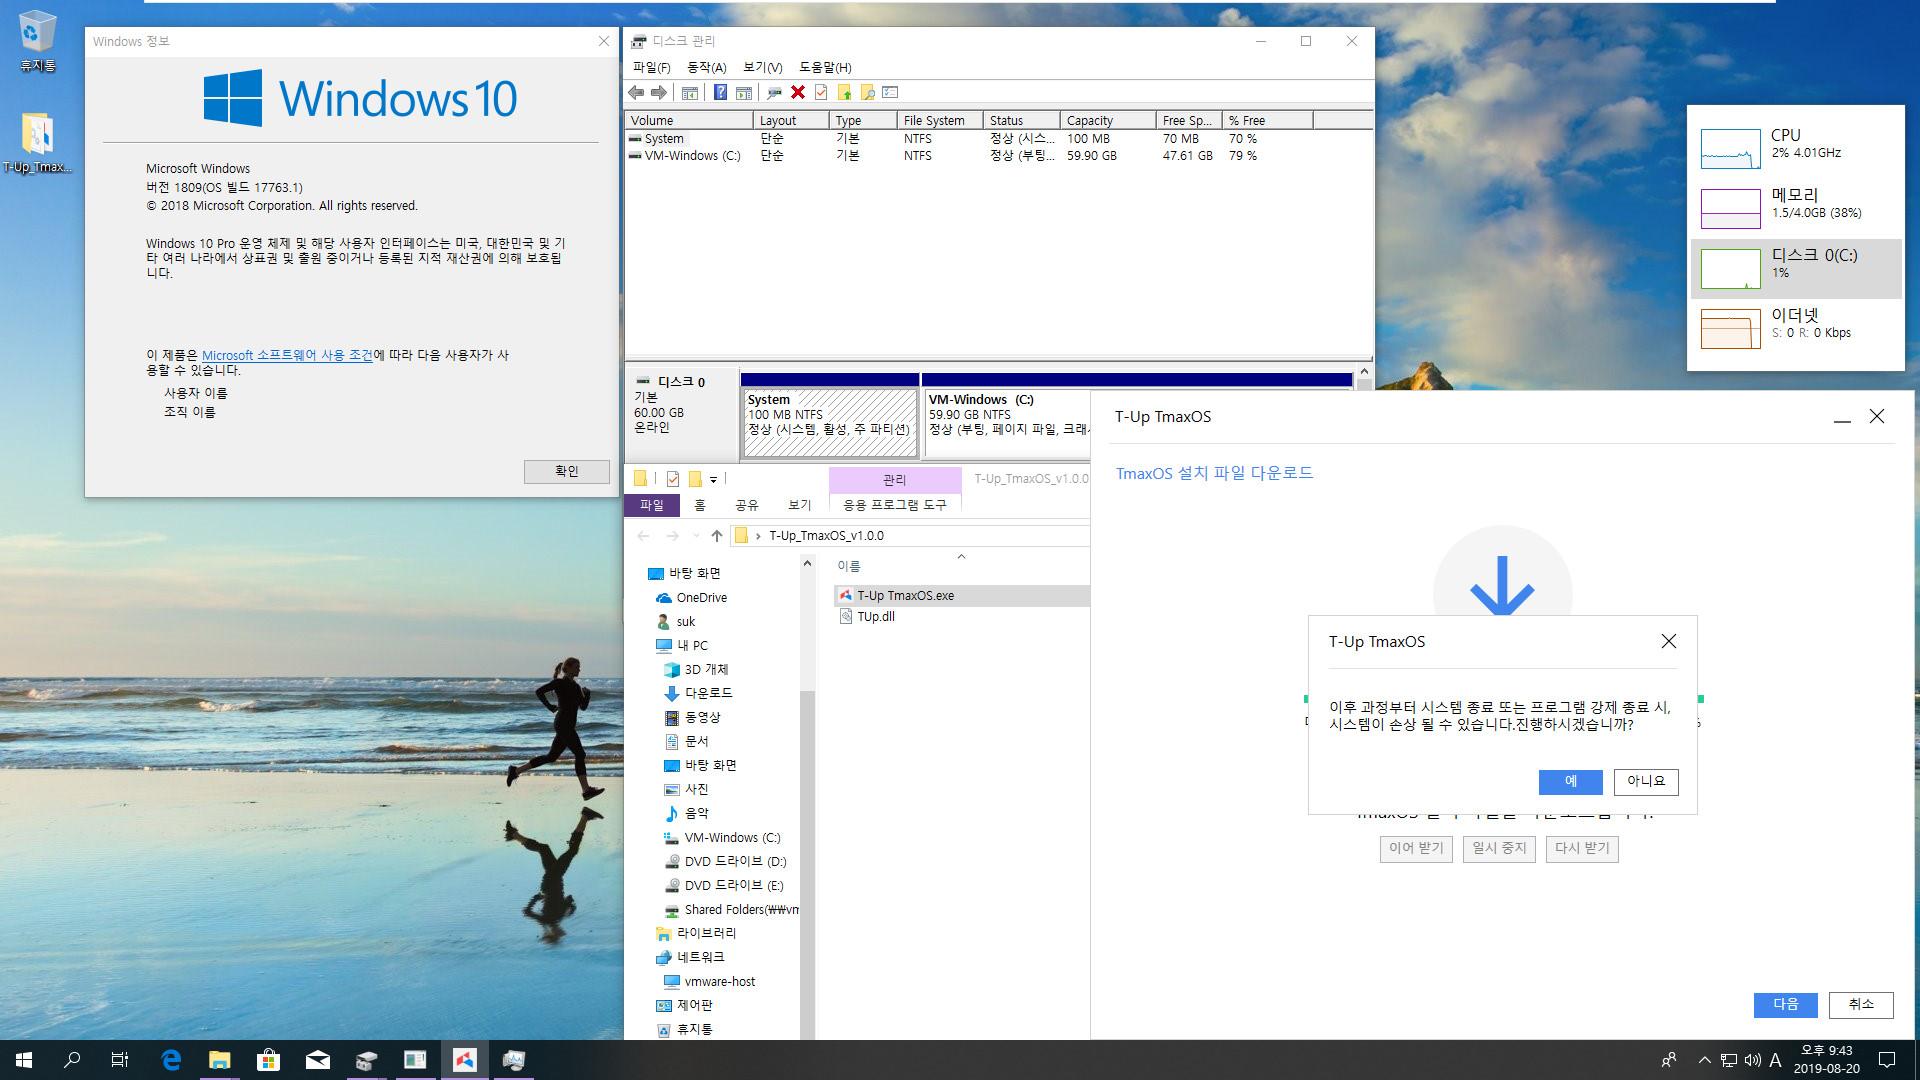 TmaxOS 설치 테스트 - 2번째 시도 - 이번에는 윈도에서 Tmax에서 제공한 T-Up TmaxOS.exe 으로 멀티 부팅으로 설치하기 2019-08-20_214316.jpg